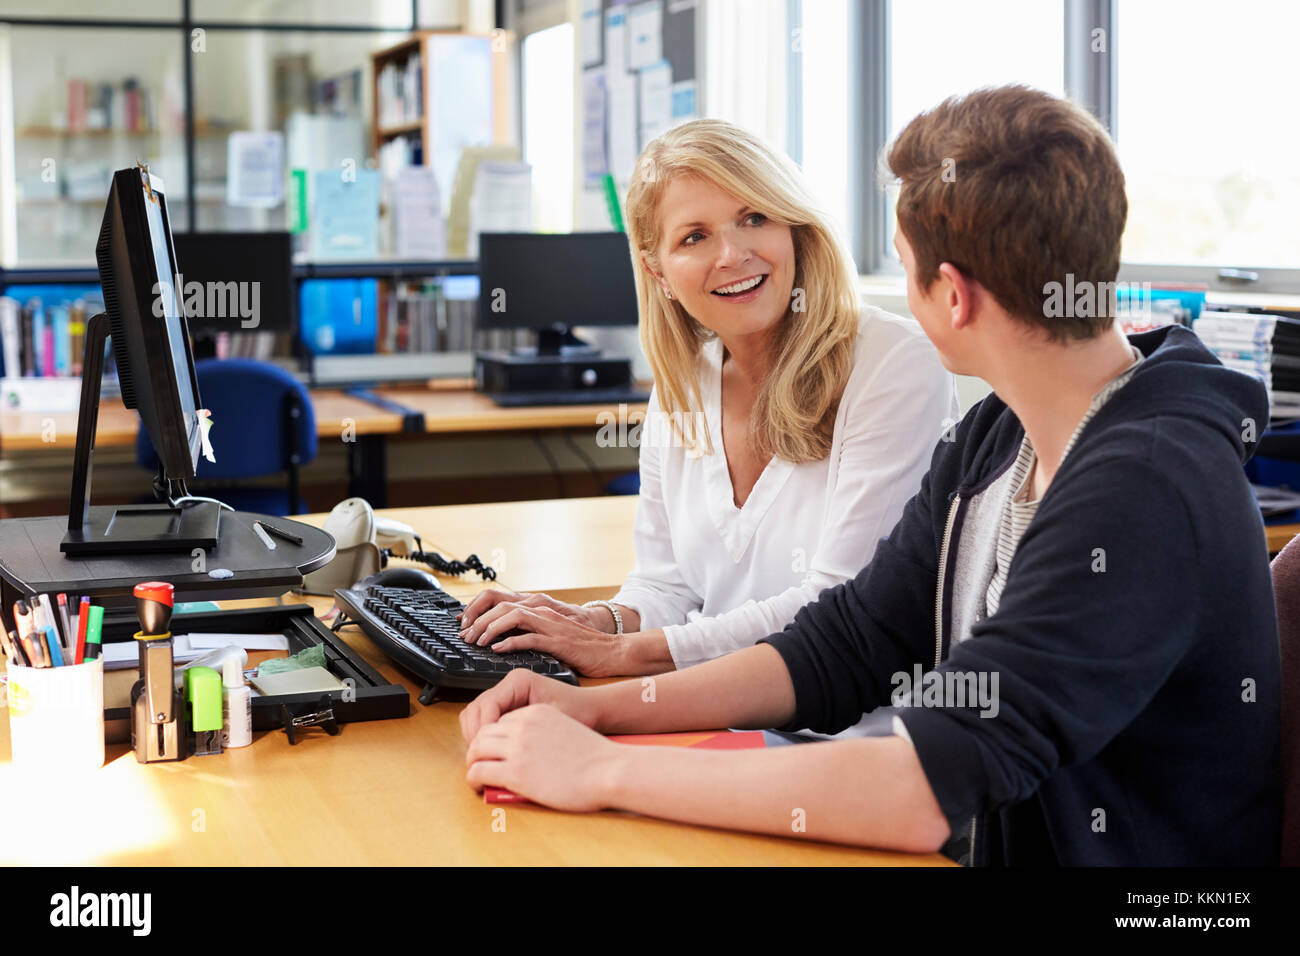 Female Careers Advisor Meeting Male College Student - Stock Image